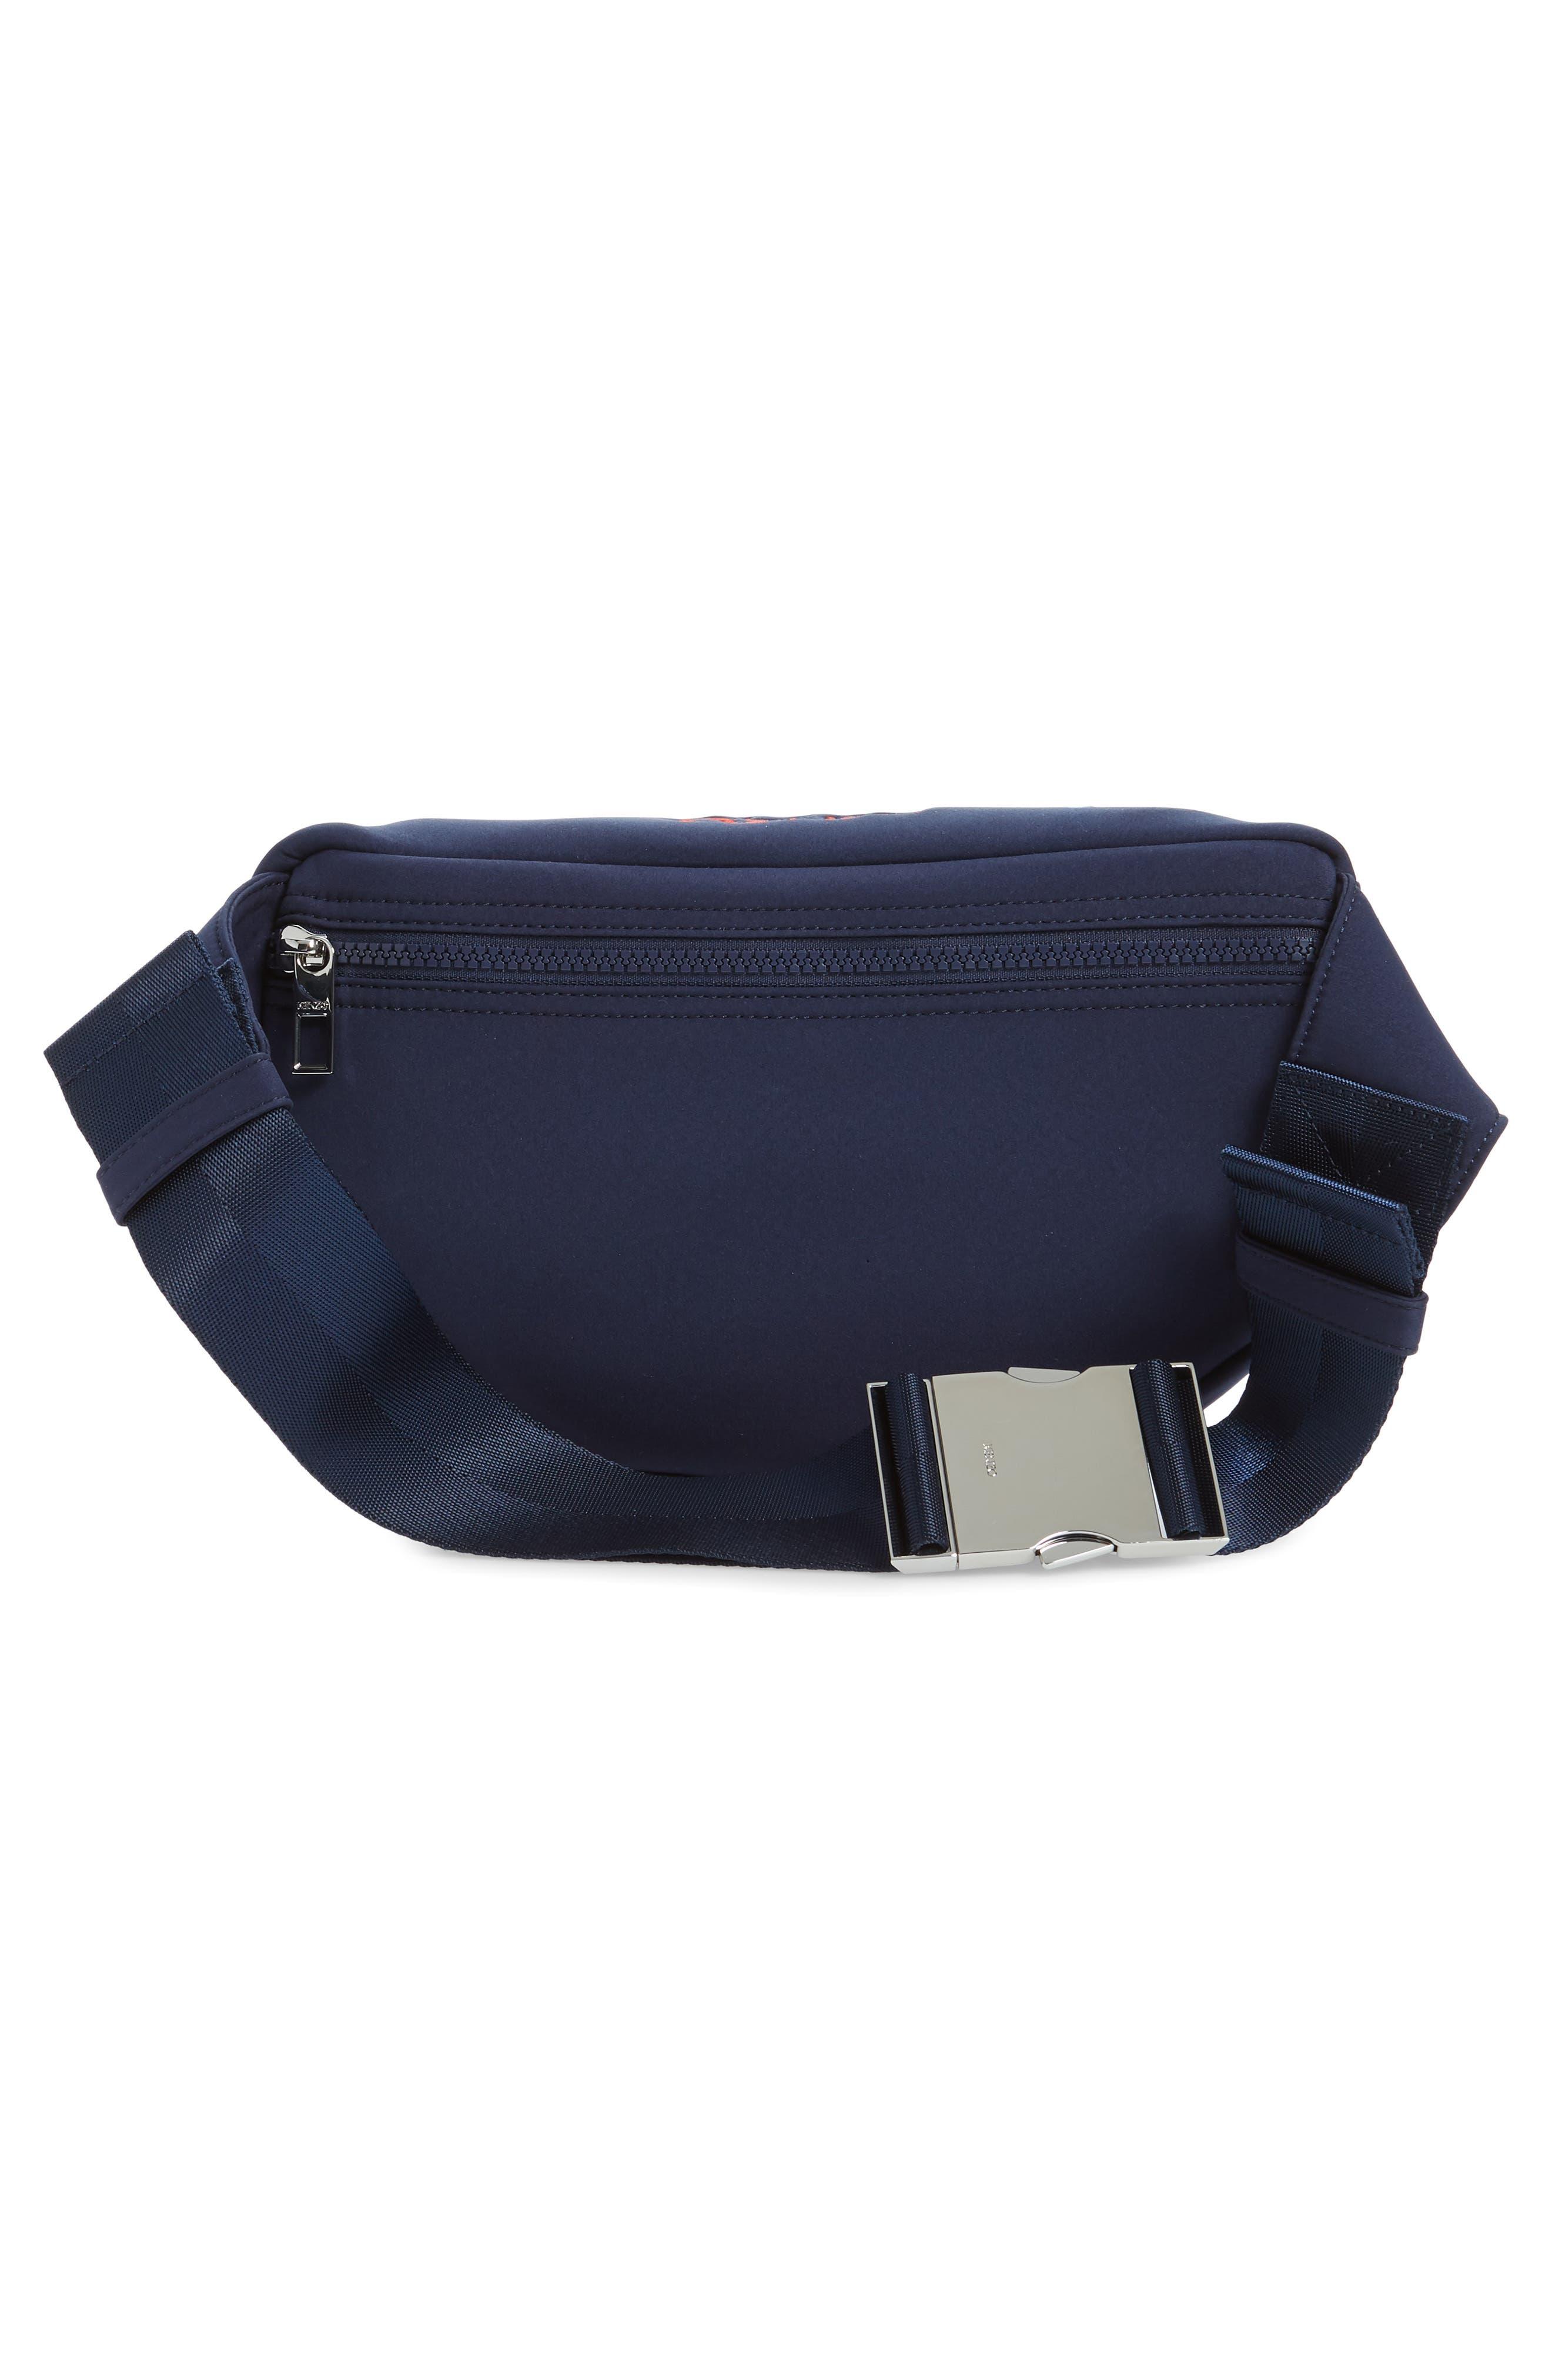 KENZO, Embroidered Tiger Belt Bag, Alternate thumbnail 4, color, 76A NAVY BLUE